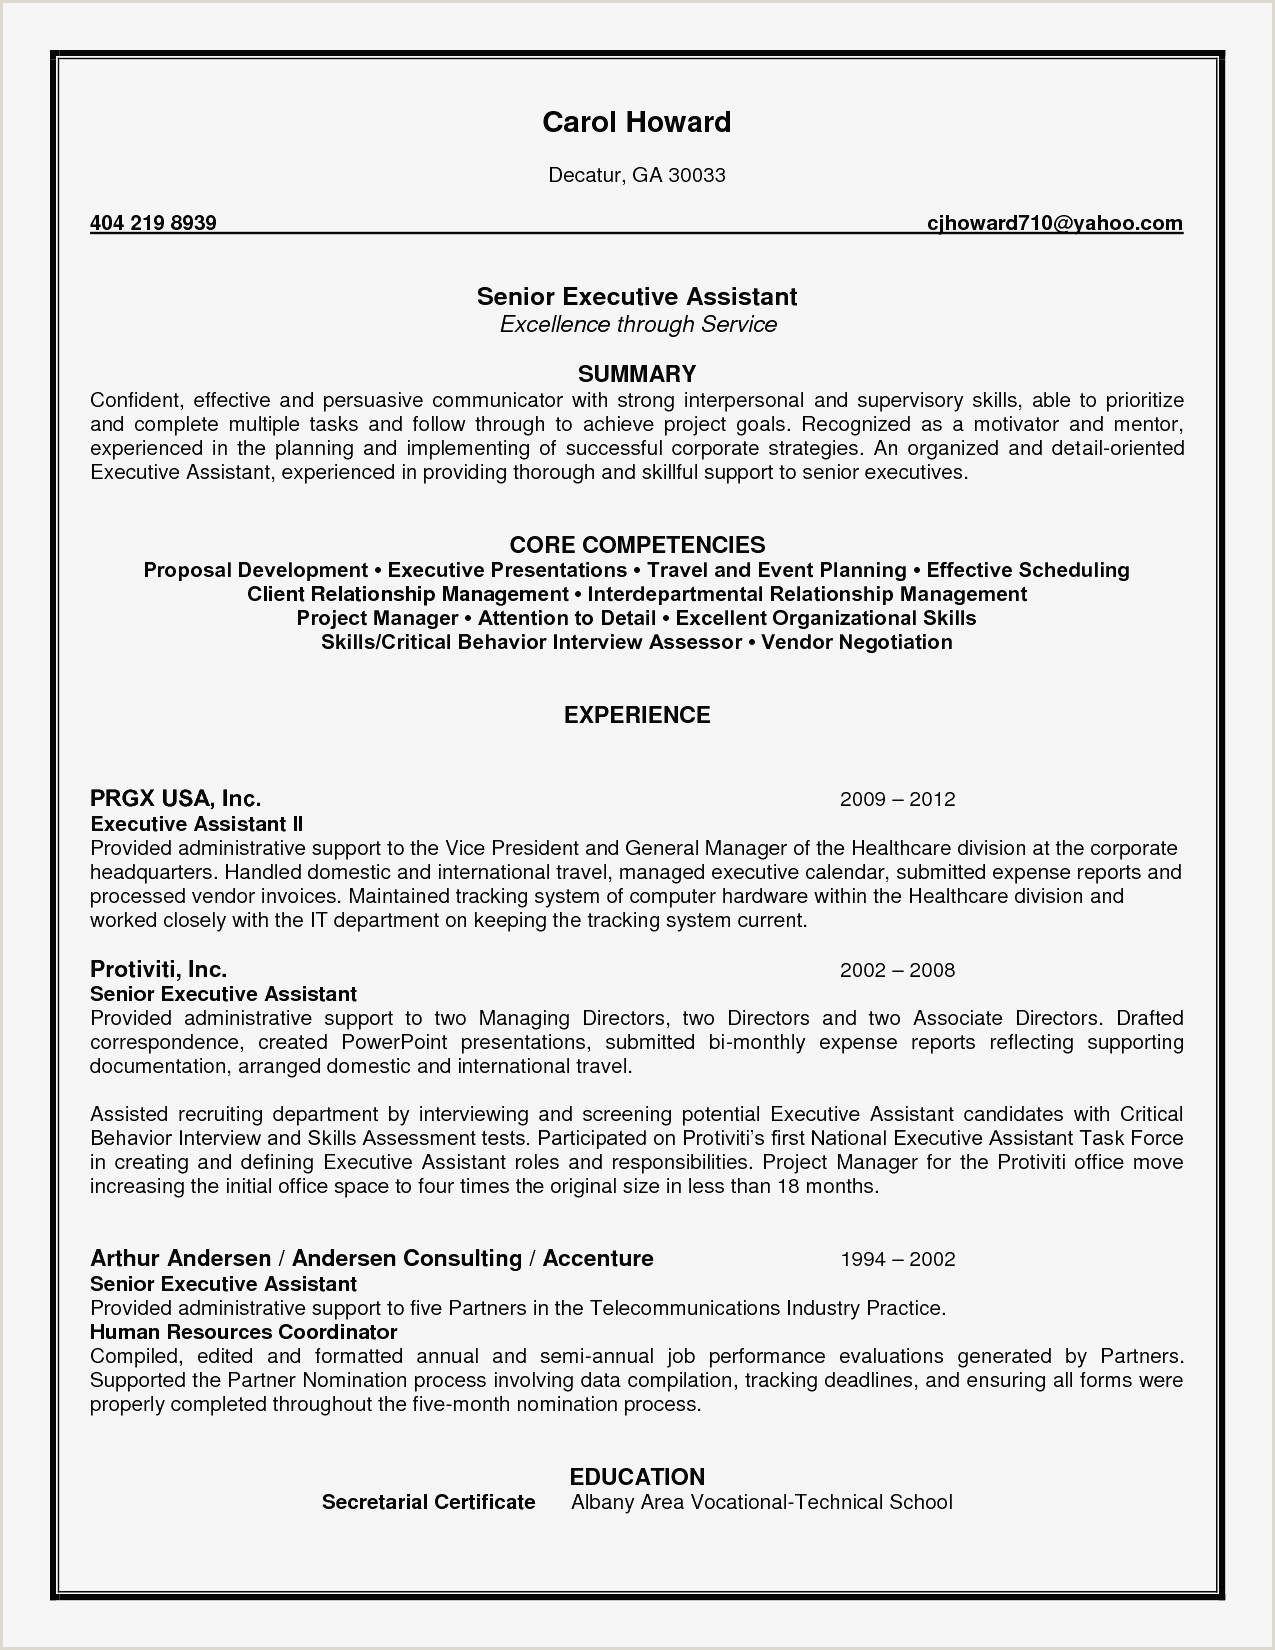 Latest Cv format for Experienced Cv Cadre Dirigeant Magnifique Simple Job Resume Examples